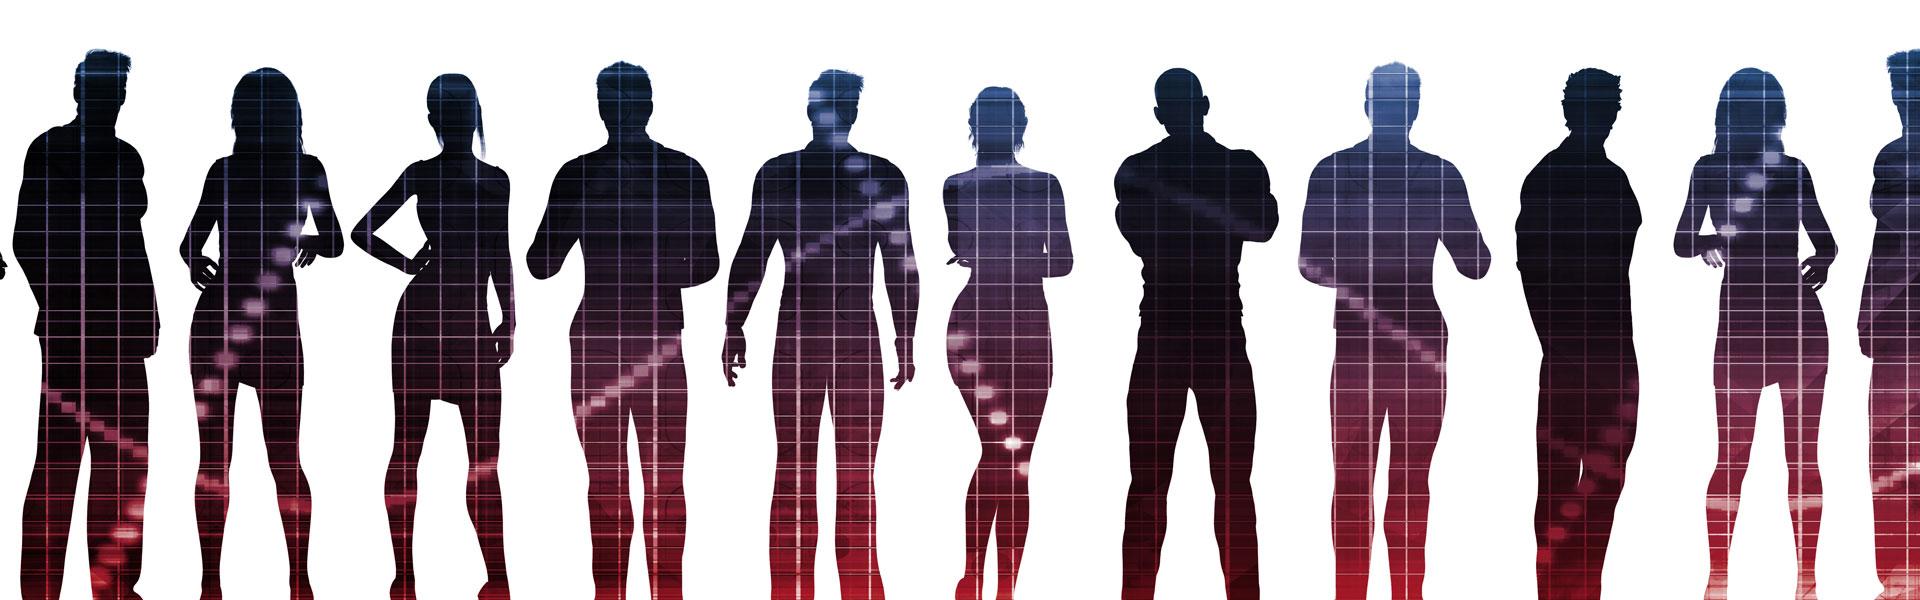 Staffing Industry Statistics